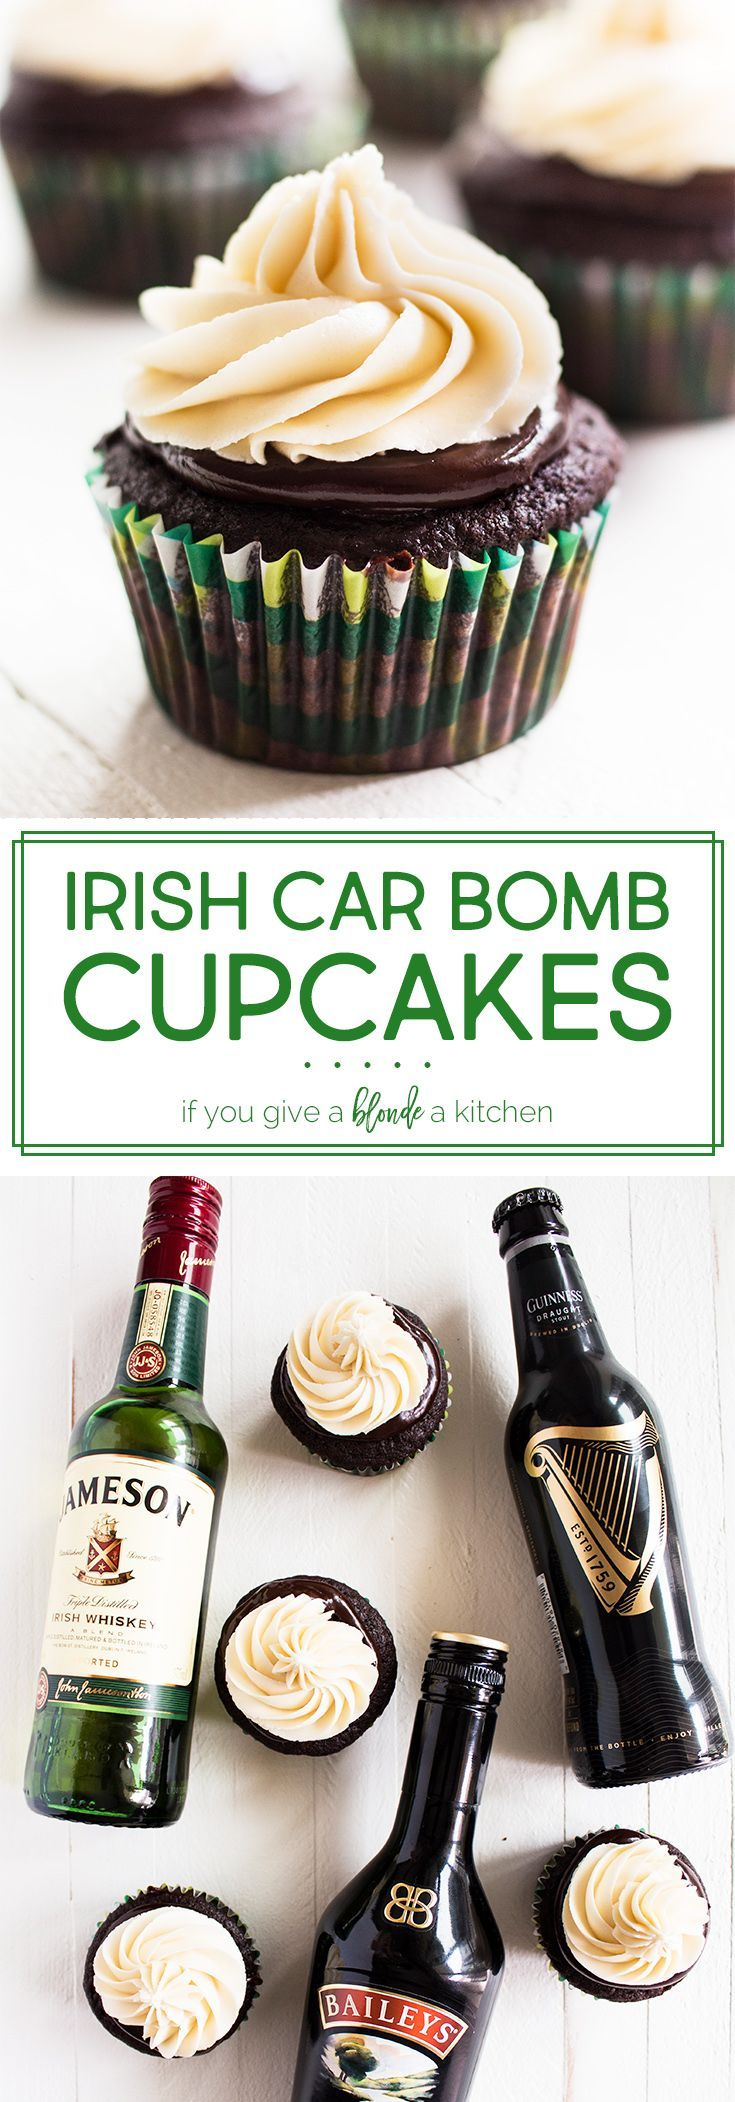 Irish Car Bomb Cupcakes #cupcakesrezepte